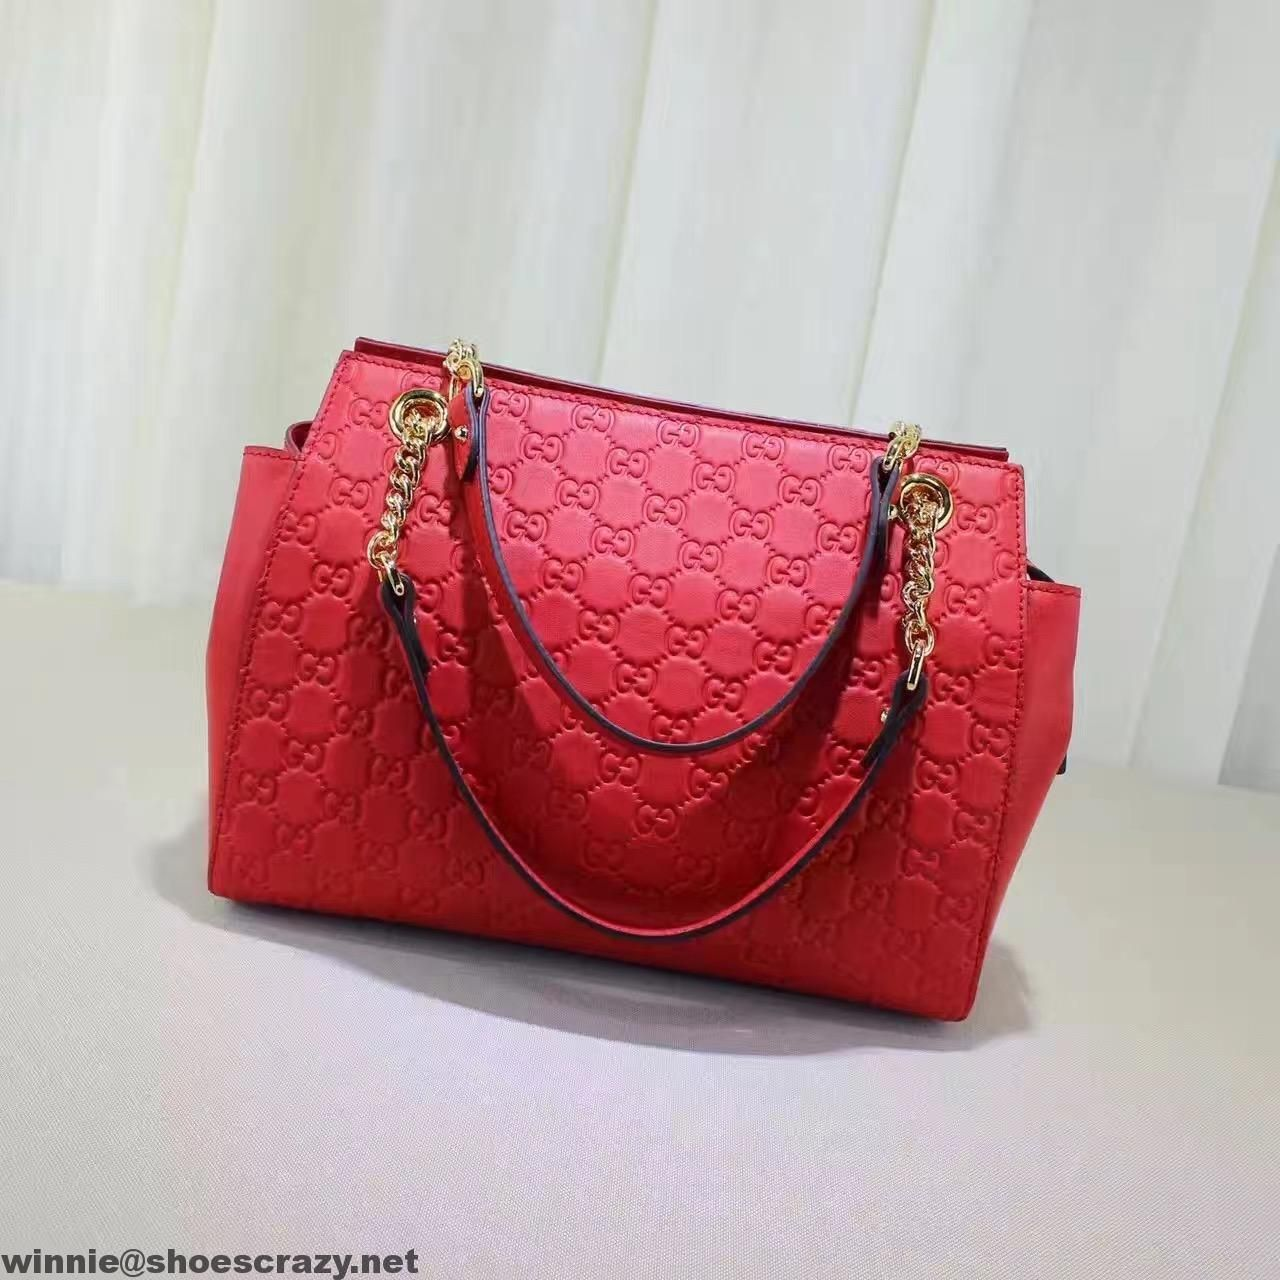 e8dd2fa960b Gucci Soft Gucci Signature Large Shoulder Bag 453771 2016   Gucci ...